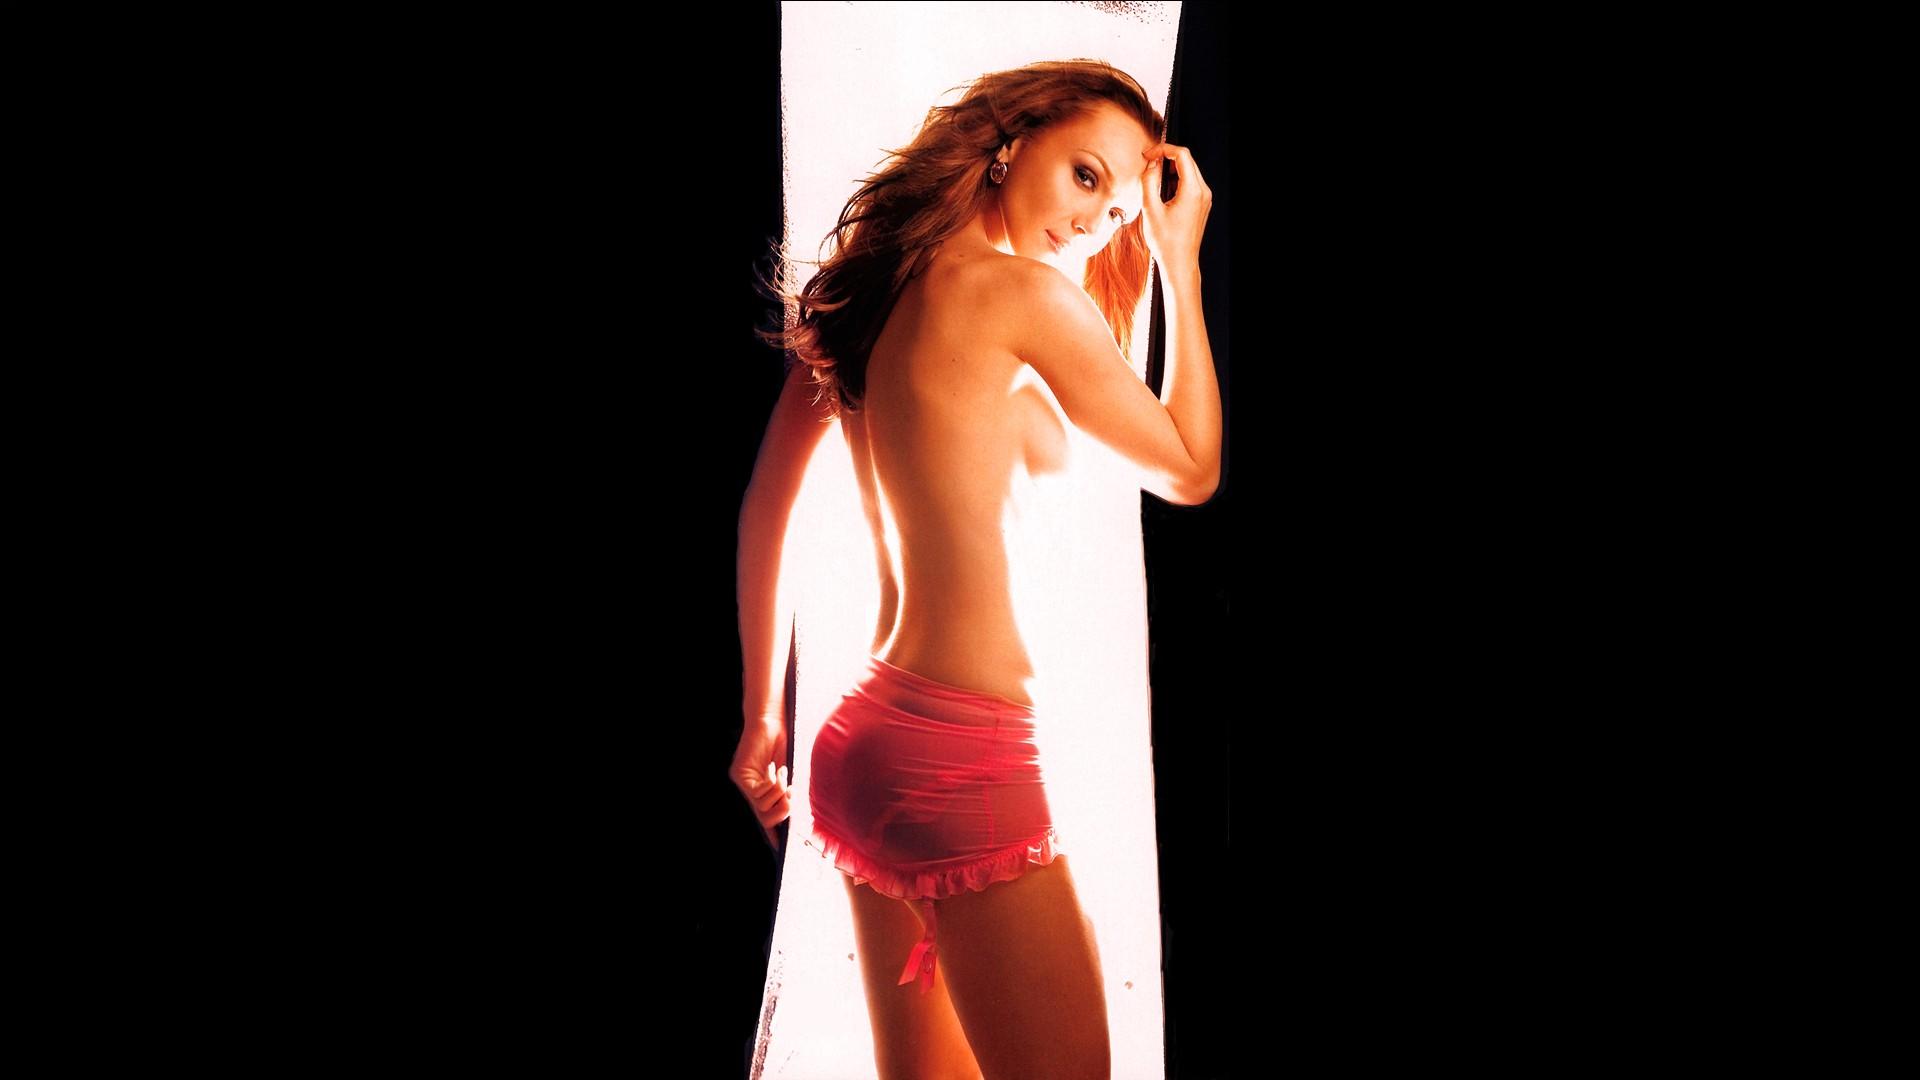 Muscular redhead women nude — pic 9